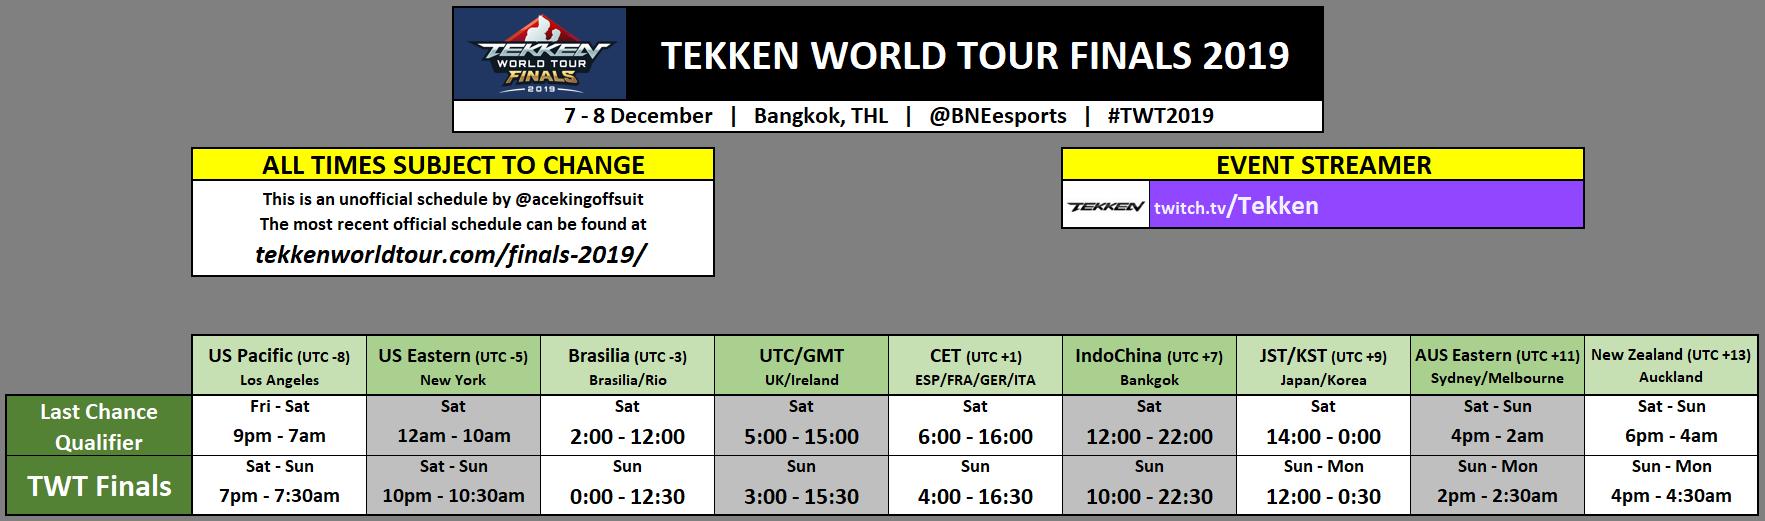 Tekken World Tour 2019 Finals Event Schedule 1 out of 1 image gallery